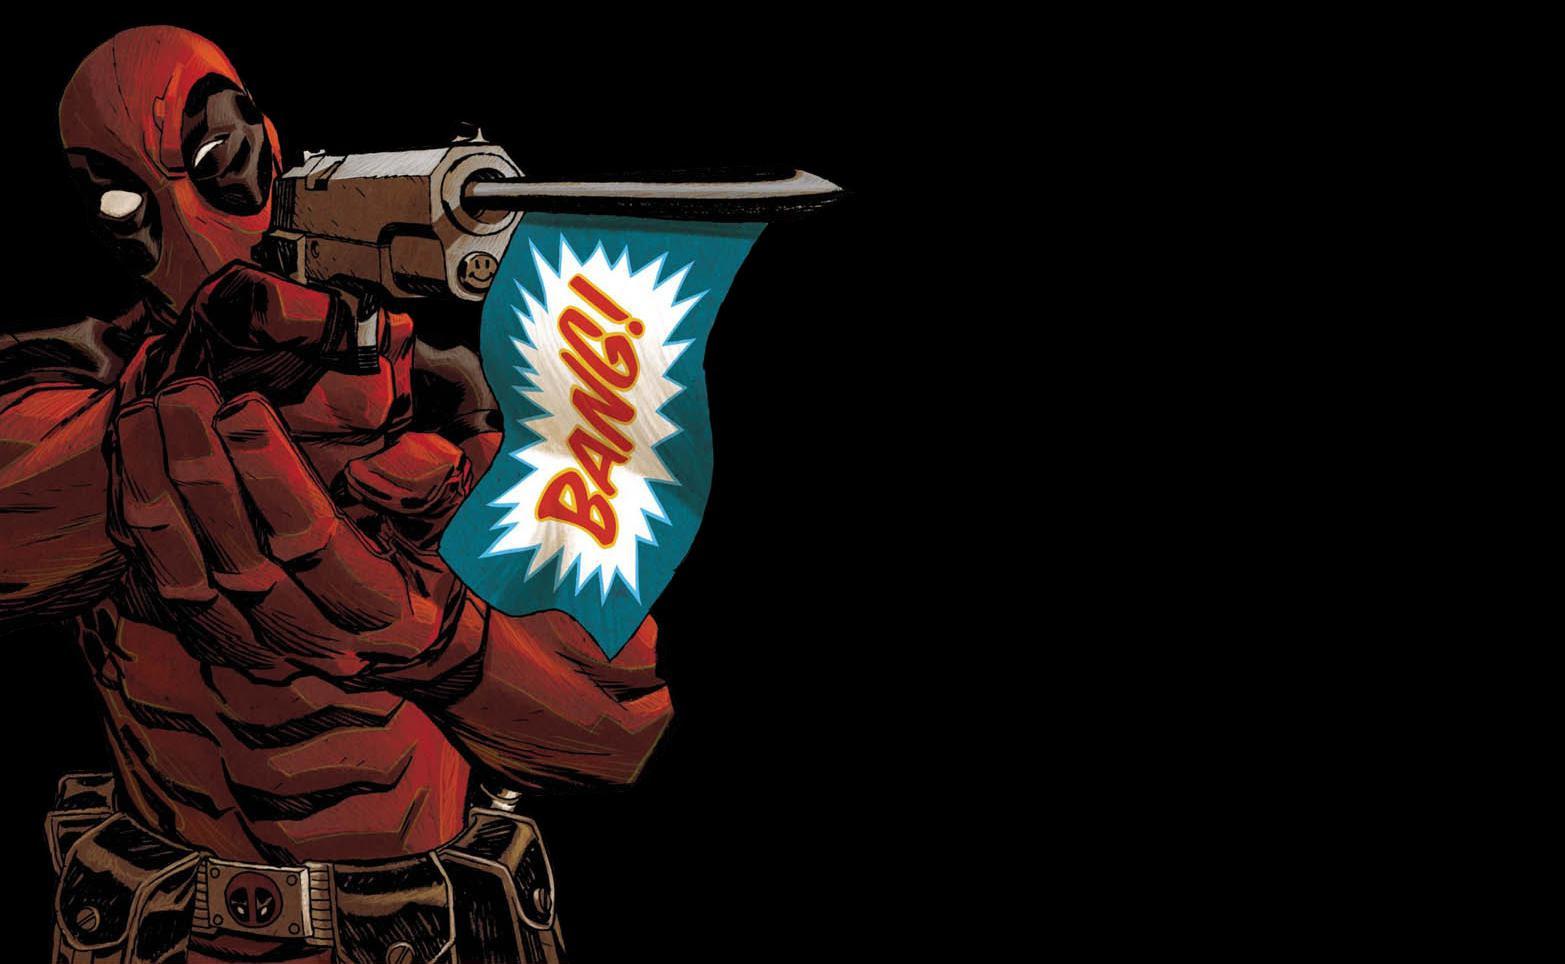 Deadpool Cartoon Mobile Wallpaper